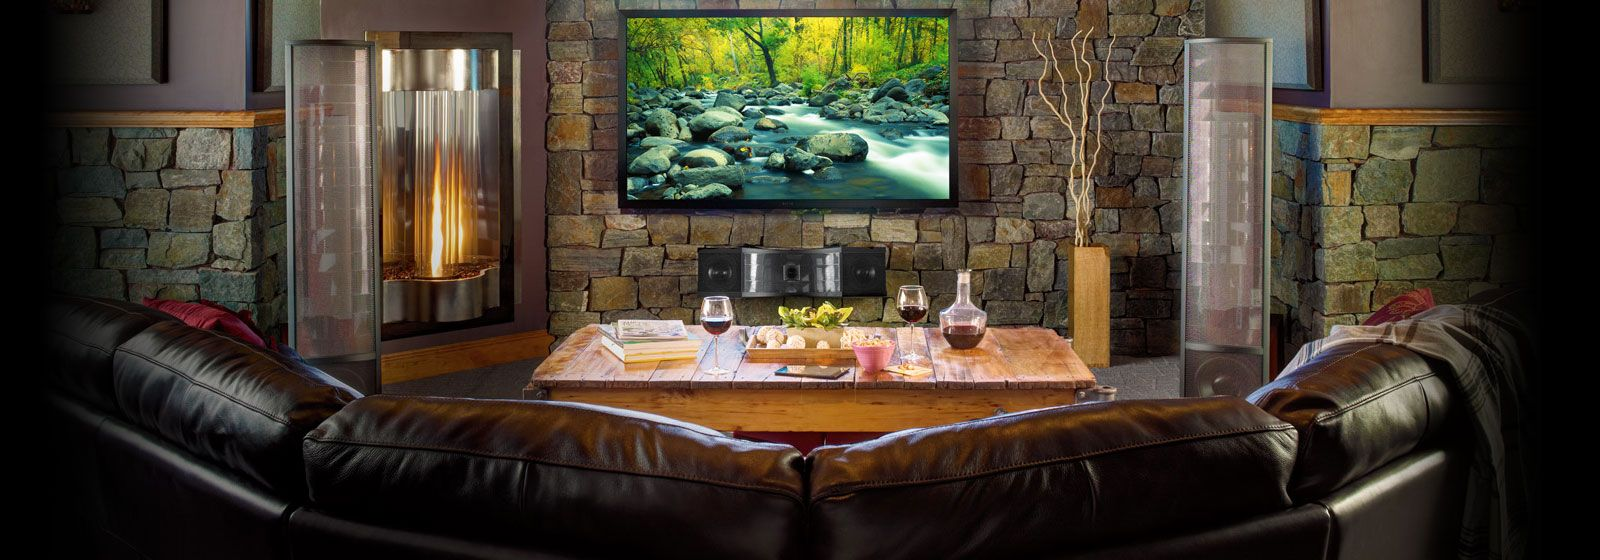 Living Led Tv Setup